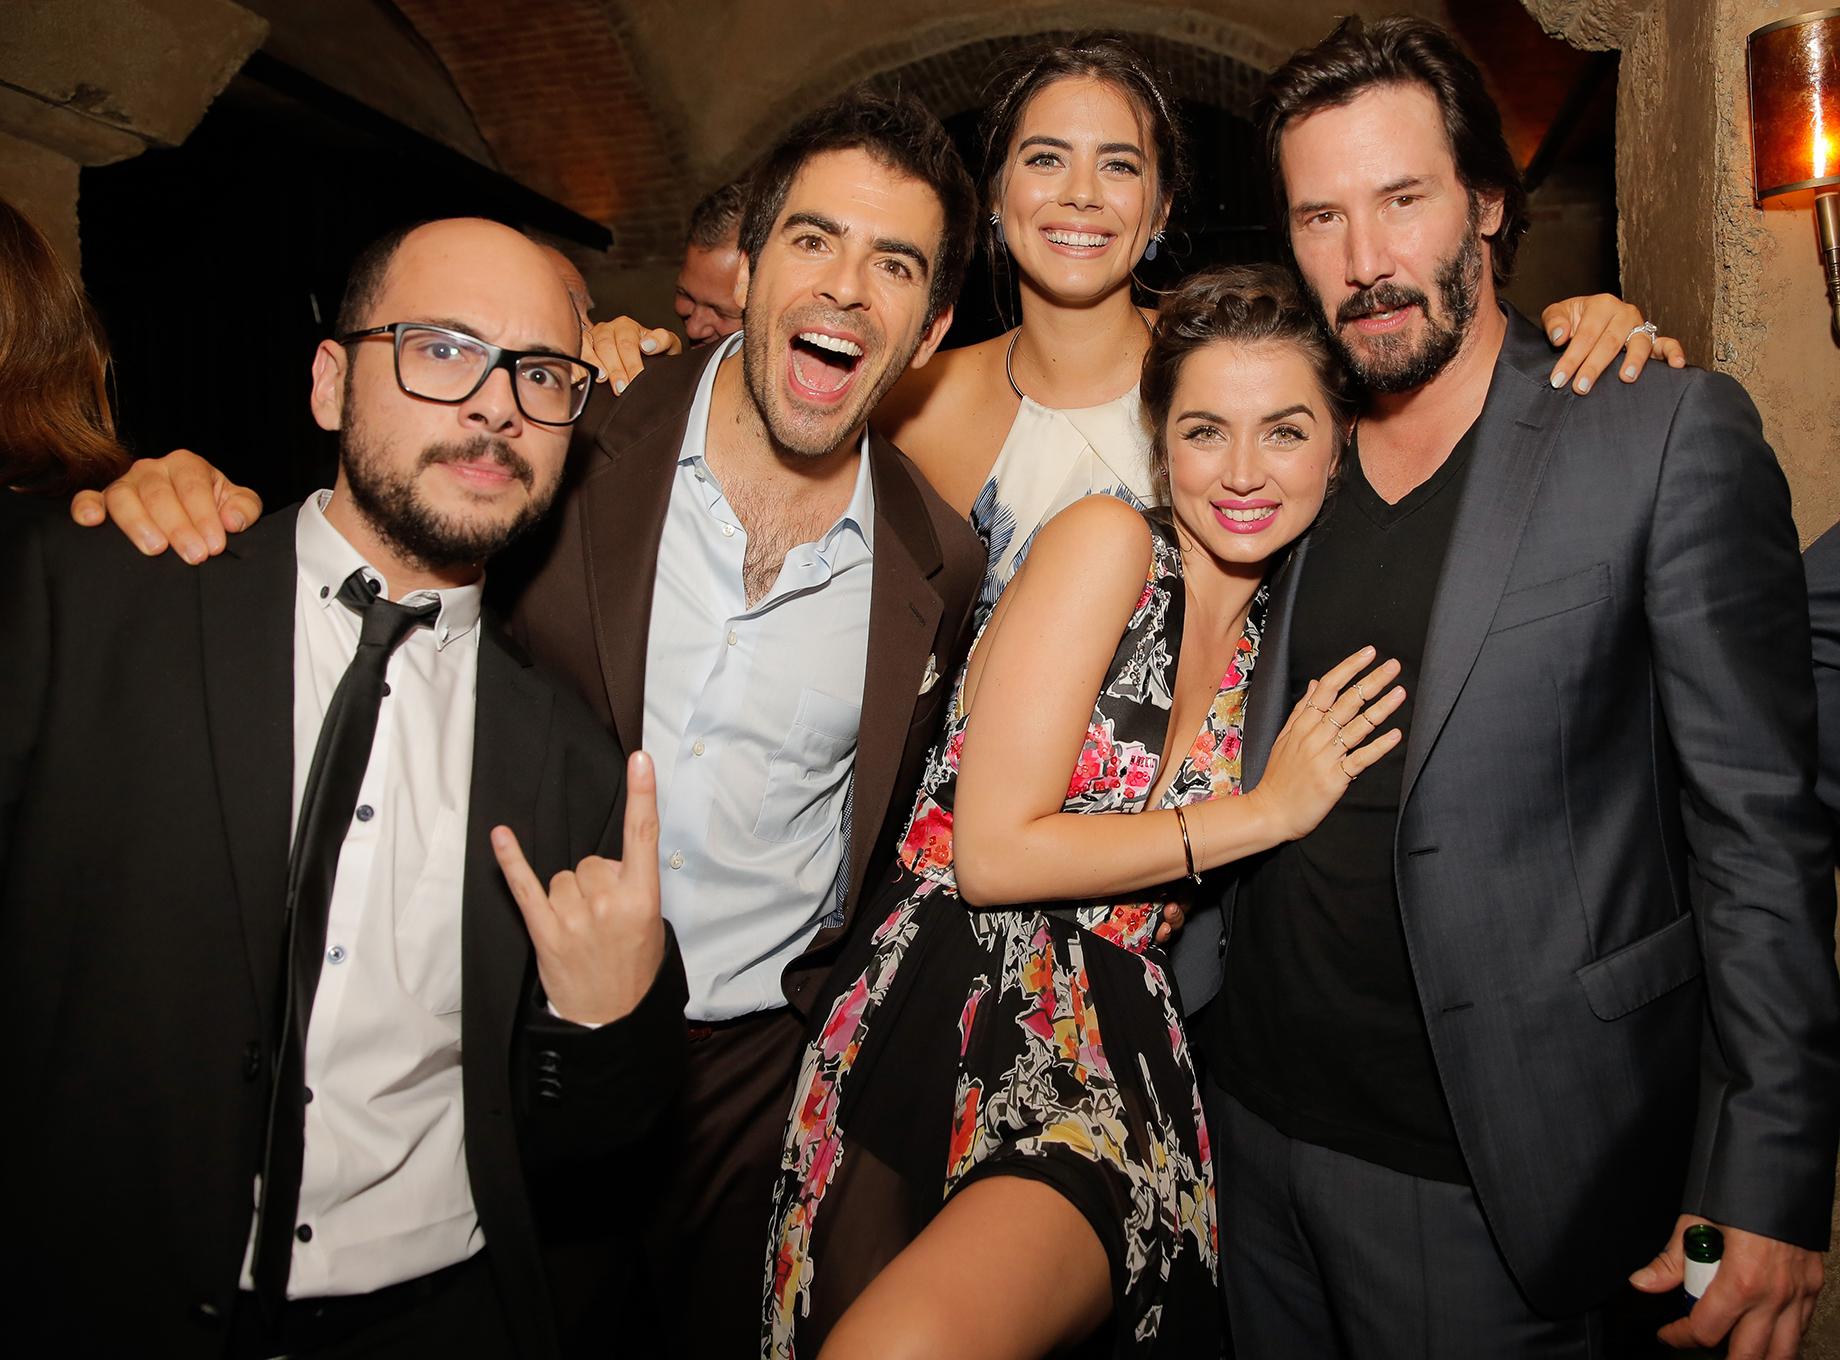 Nicolas Lopez, Eli Roth, Lorenza Izzo, Ana De Armas and Keanu Reeves